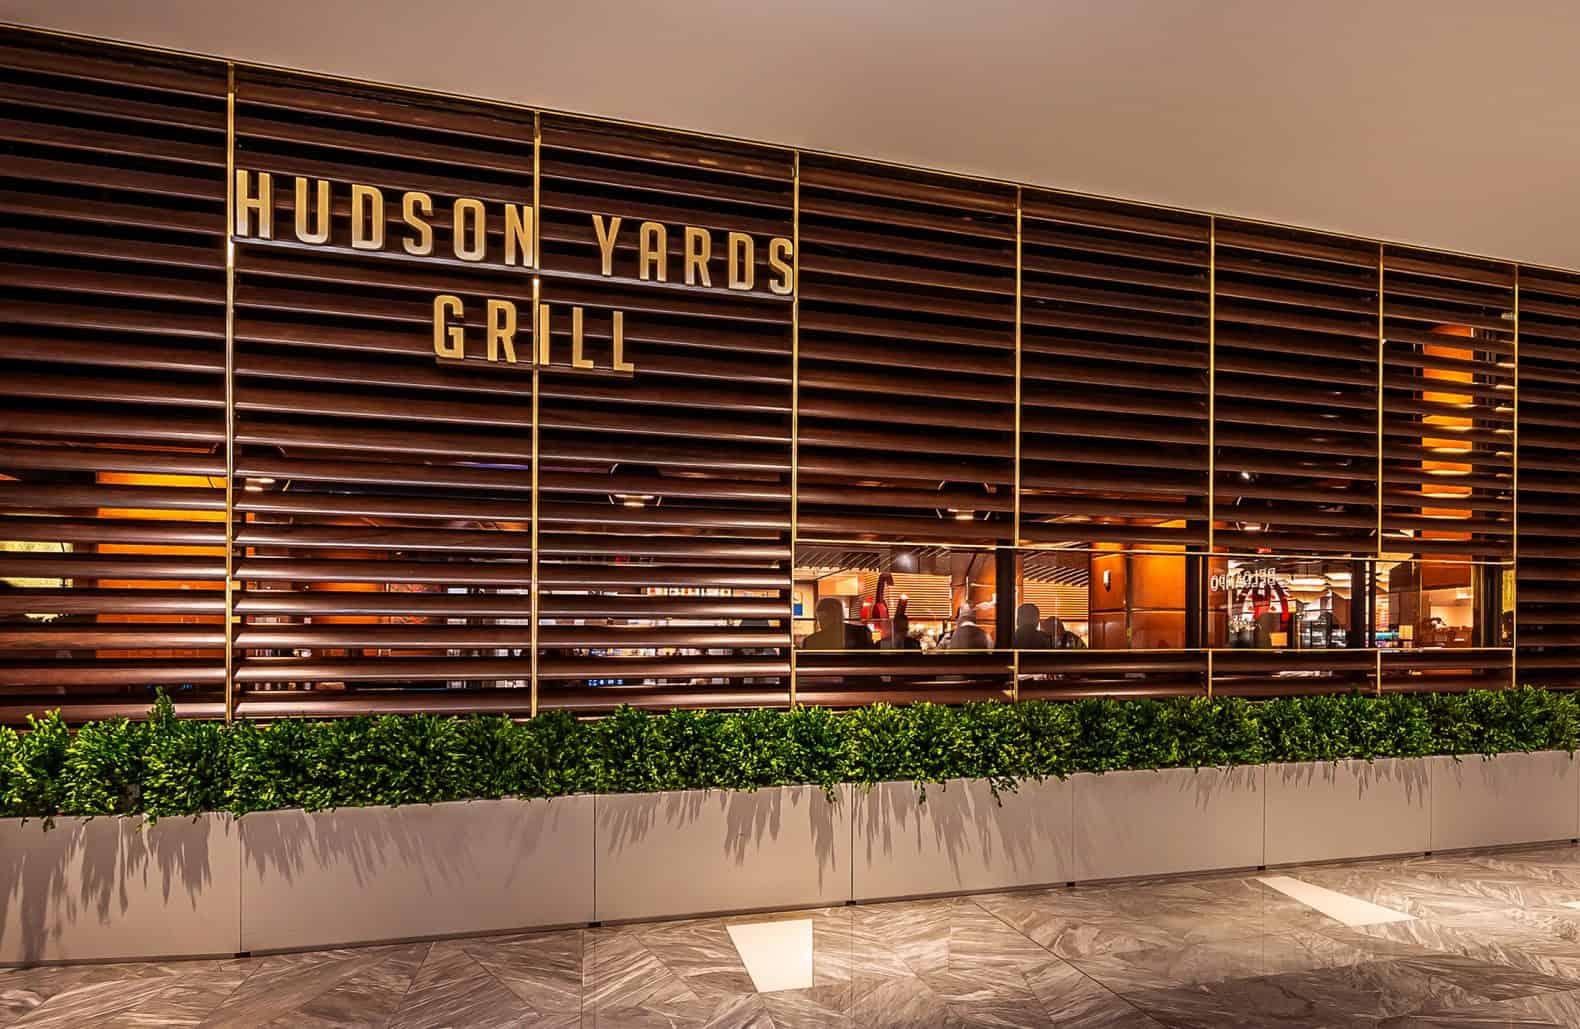 HUDSON YARDS GRILL